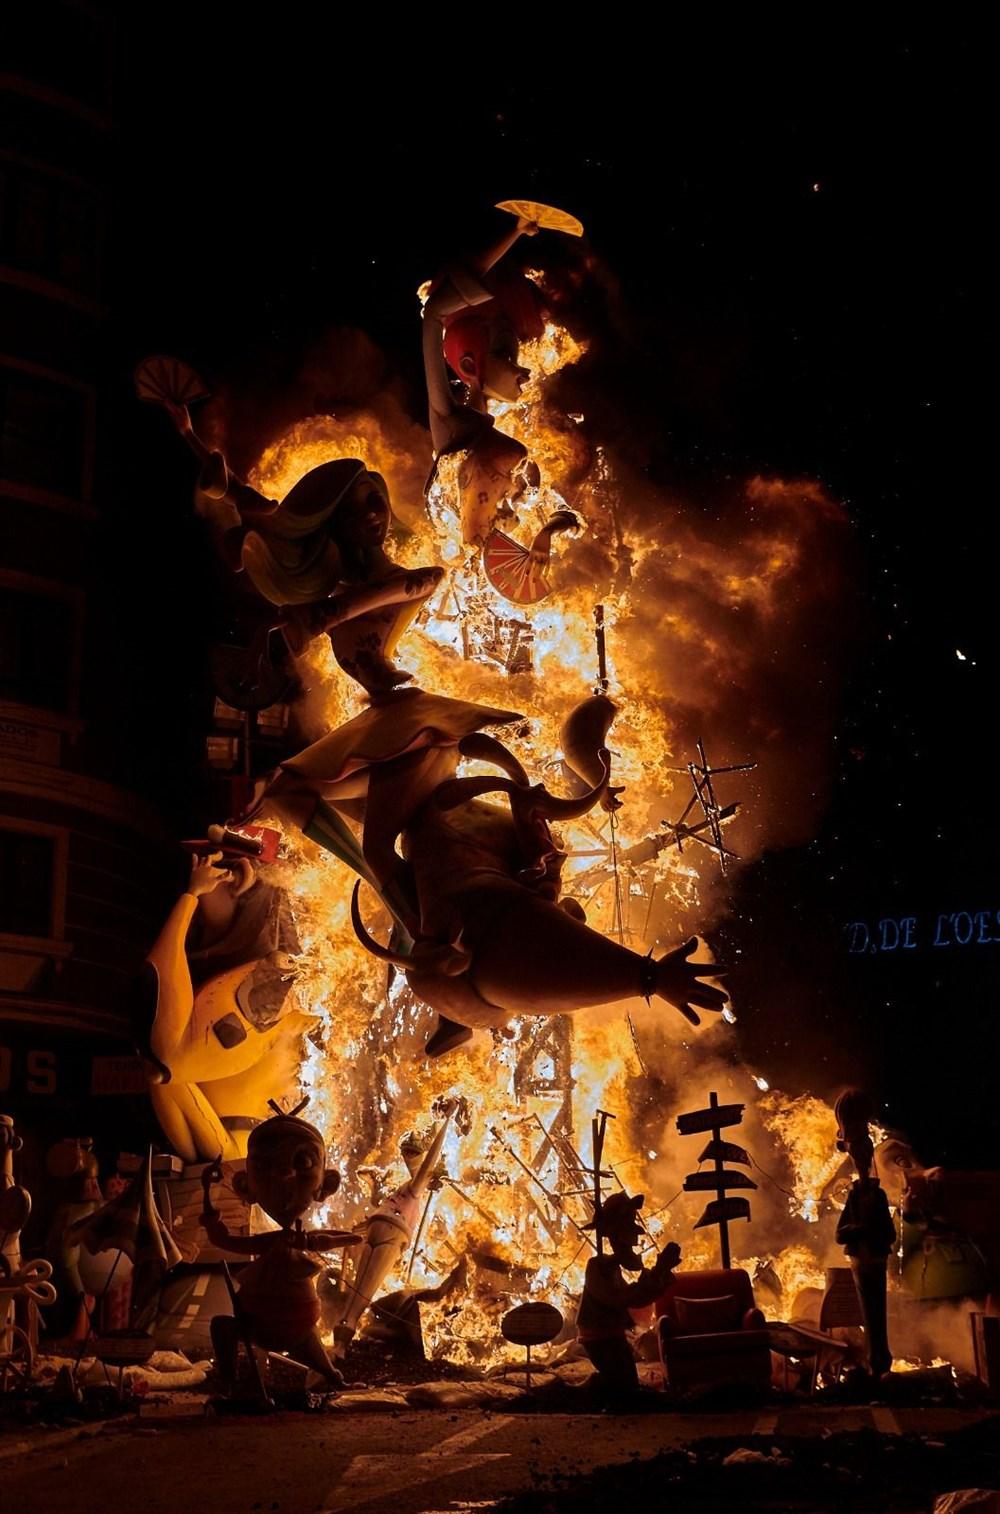 Avrupa'nın en ateşli festivali 'Las Fallas' - 9